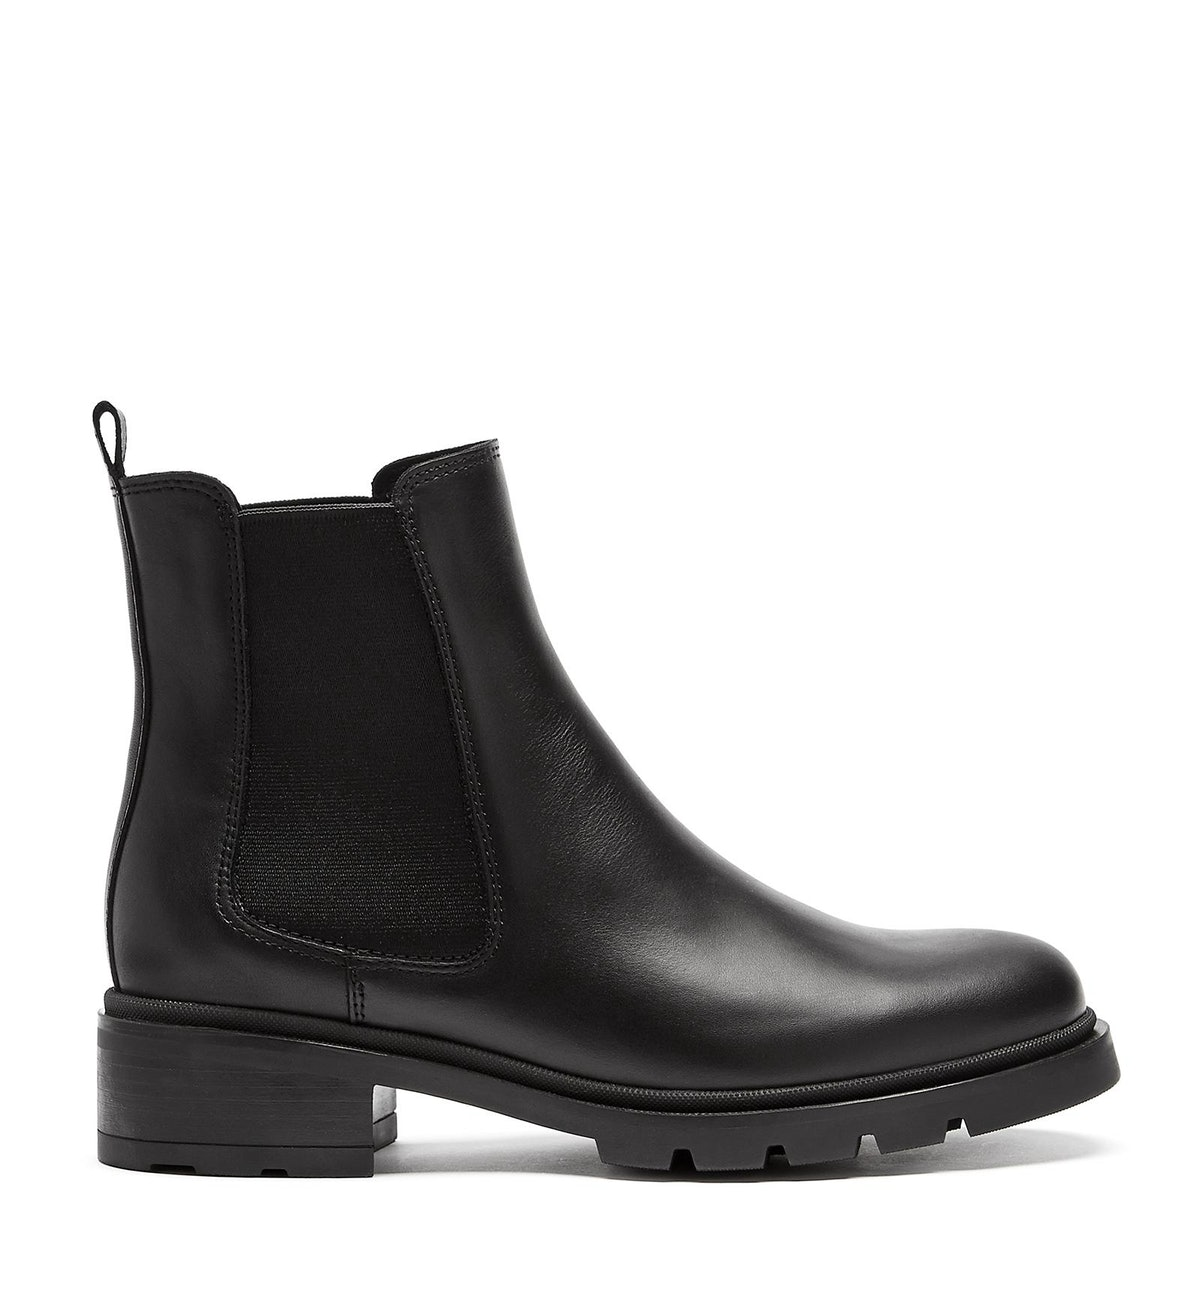 La Canadienne Sorento Boots